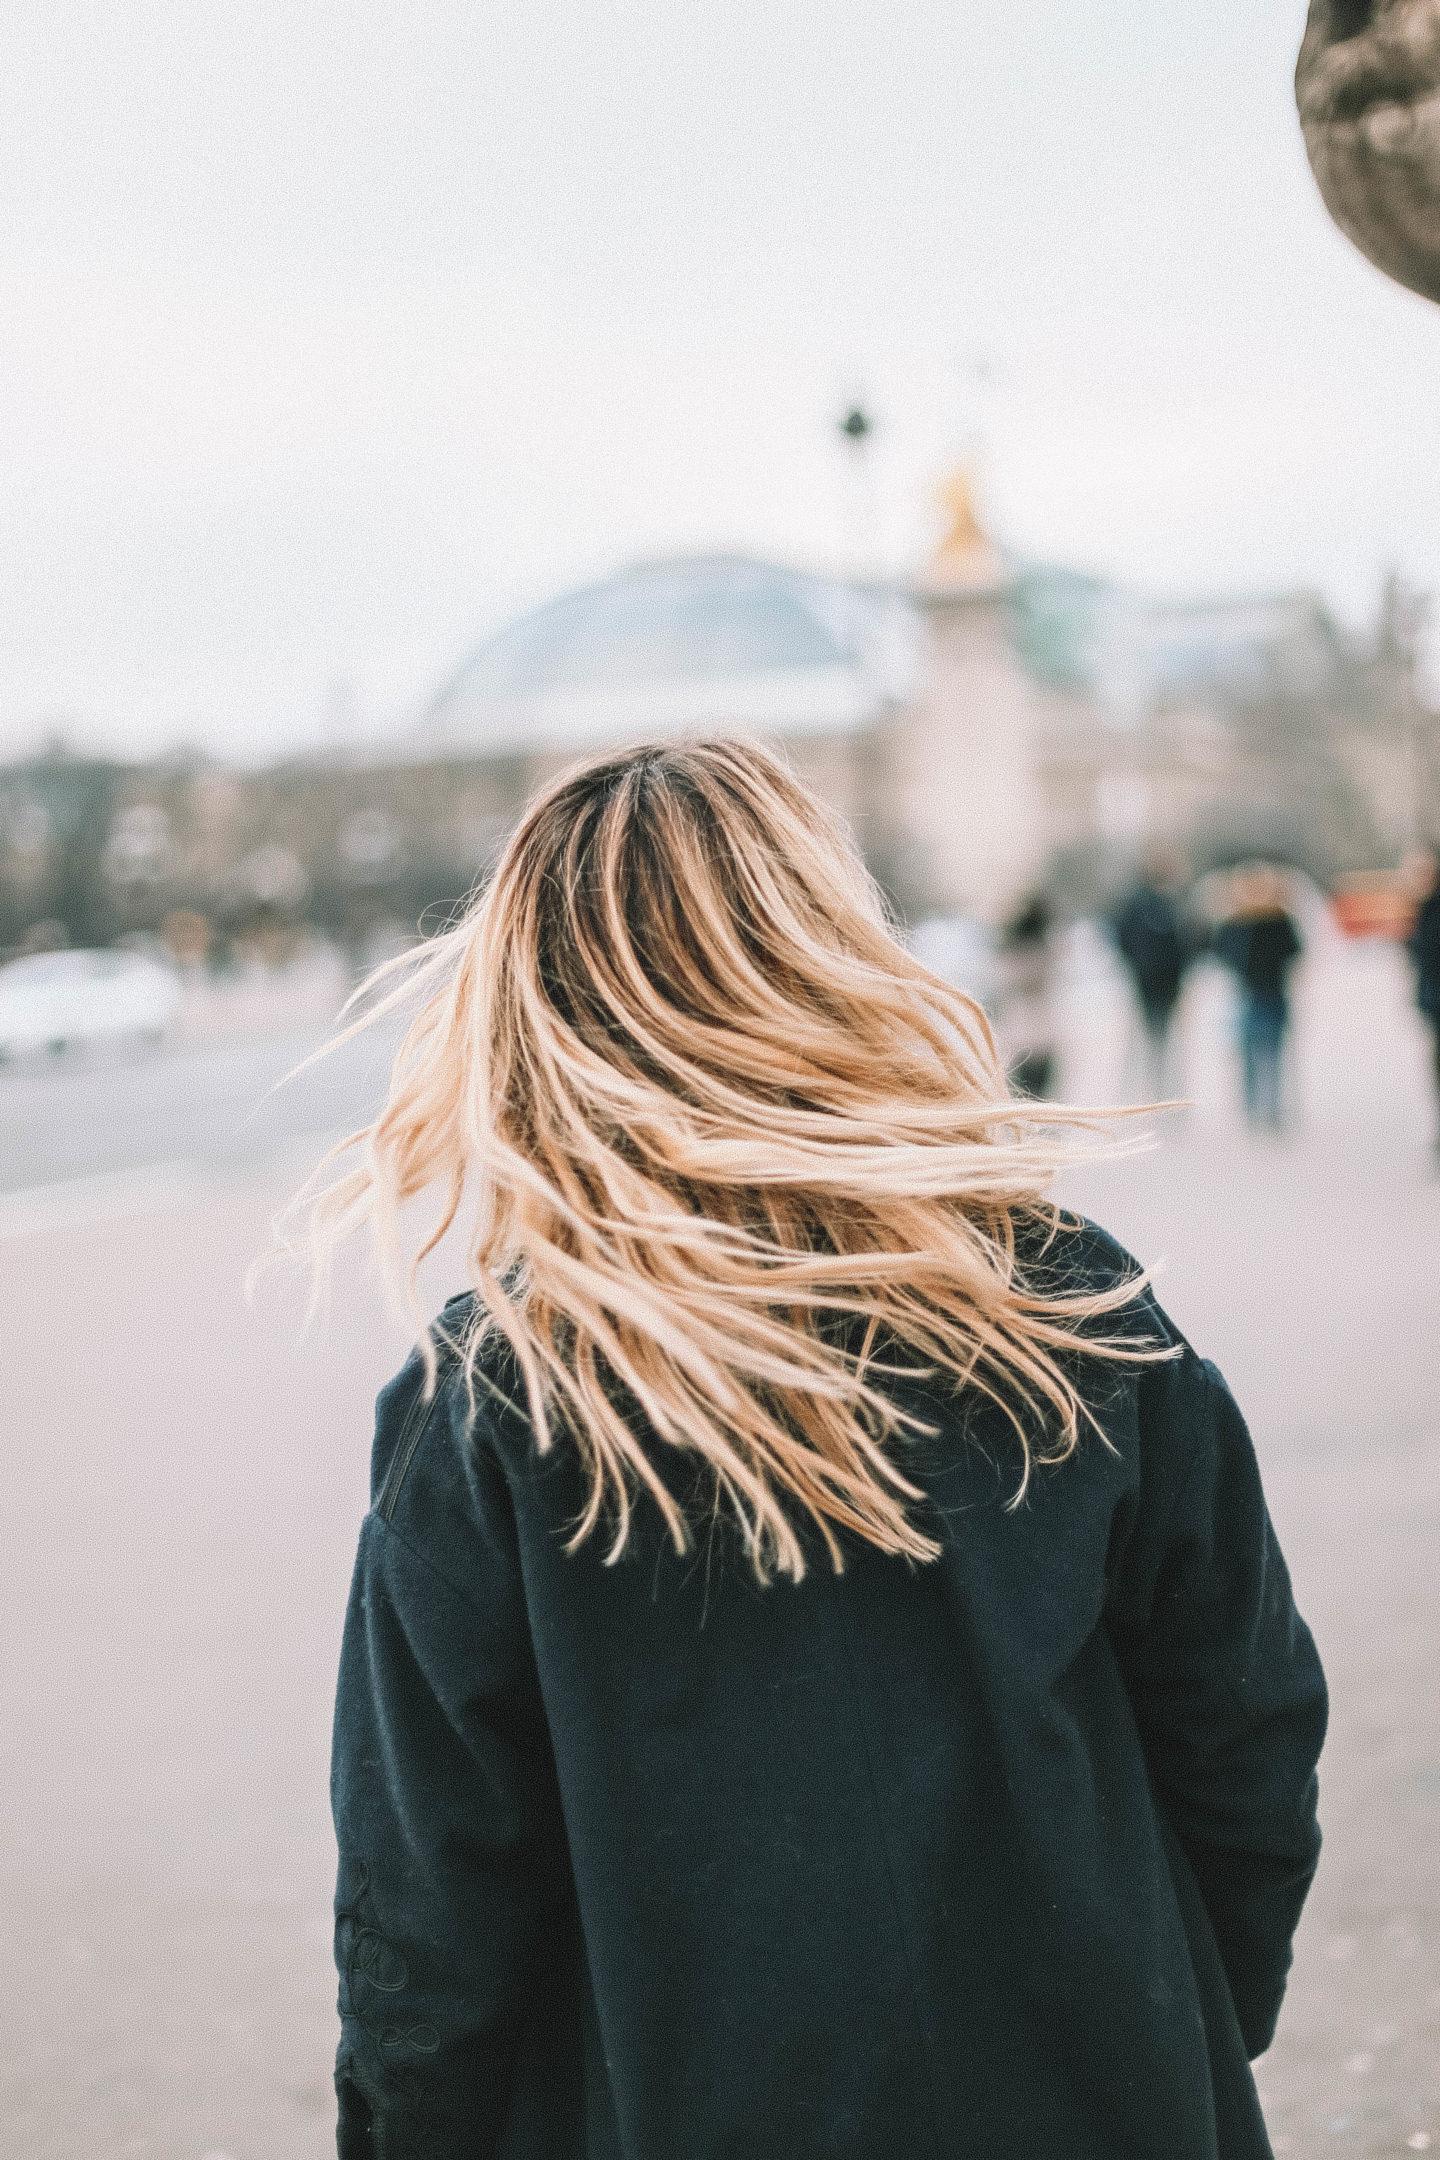 Vernissage blond - Blondie Baby blog mode et voyages